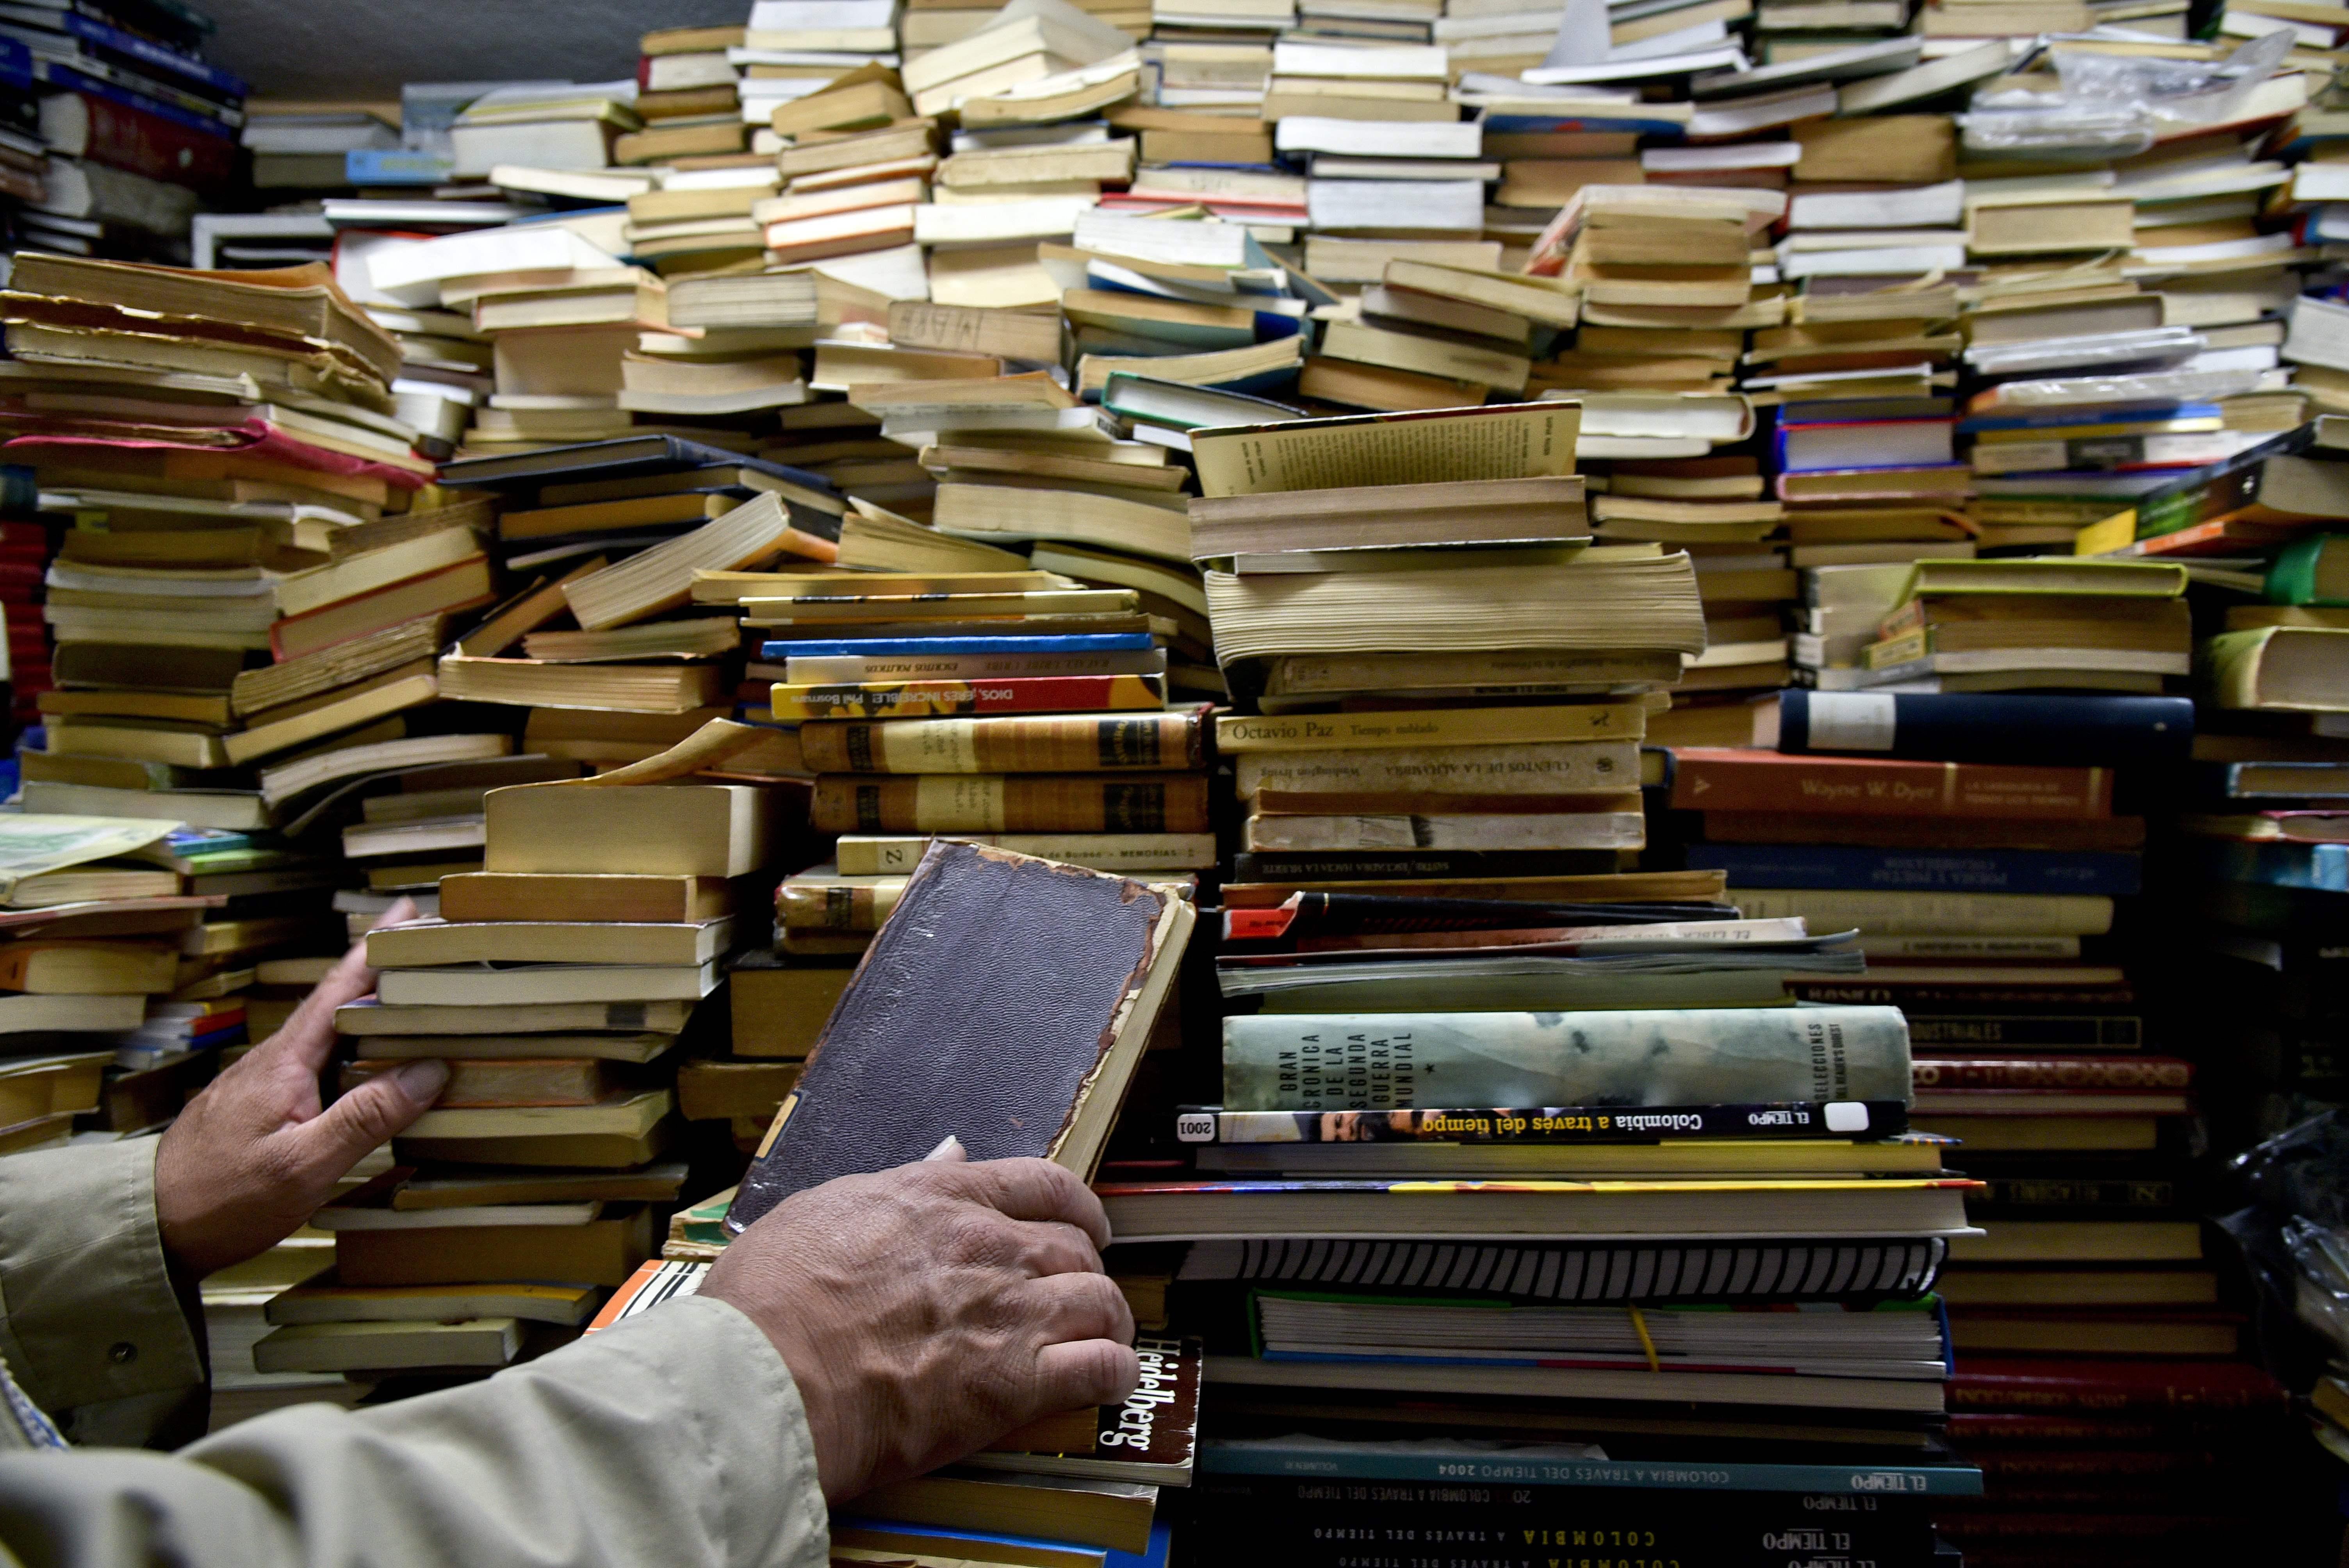 DOUNIAMAG-COLOMBIA-SOCIETY-BOOKS-RESCUER